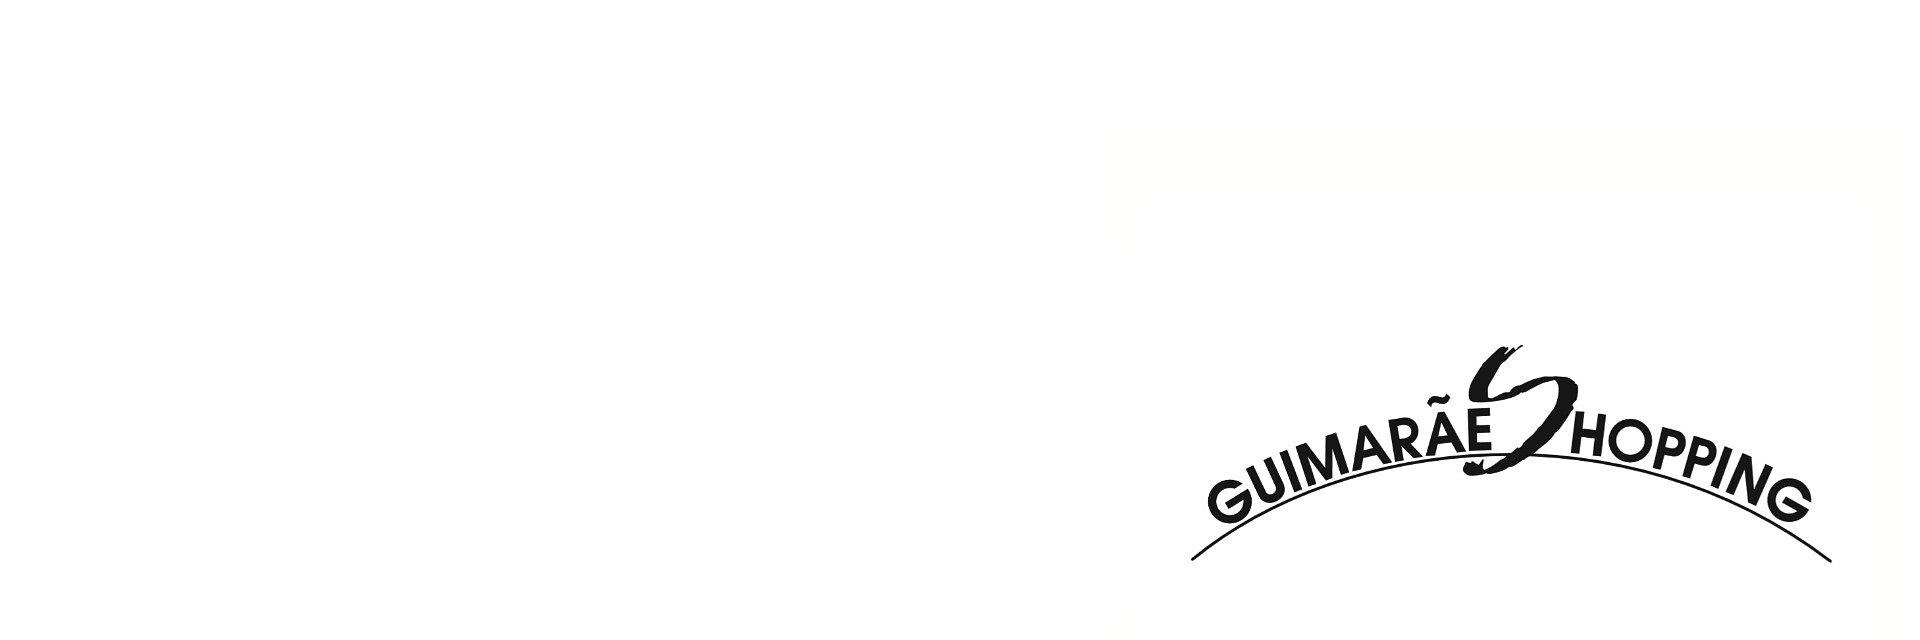 GuimarãeShopping recebe Mercadinho Vimaranense